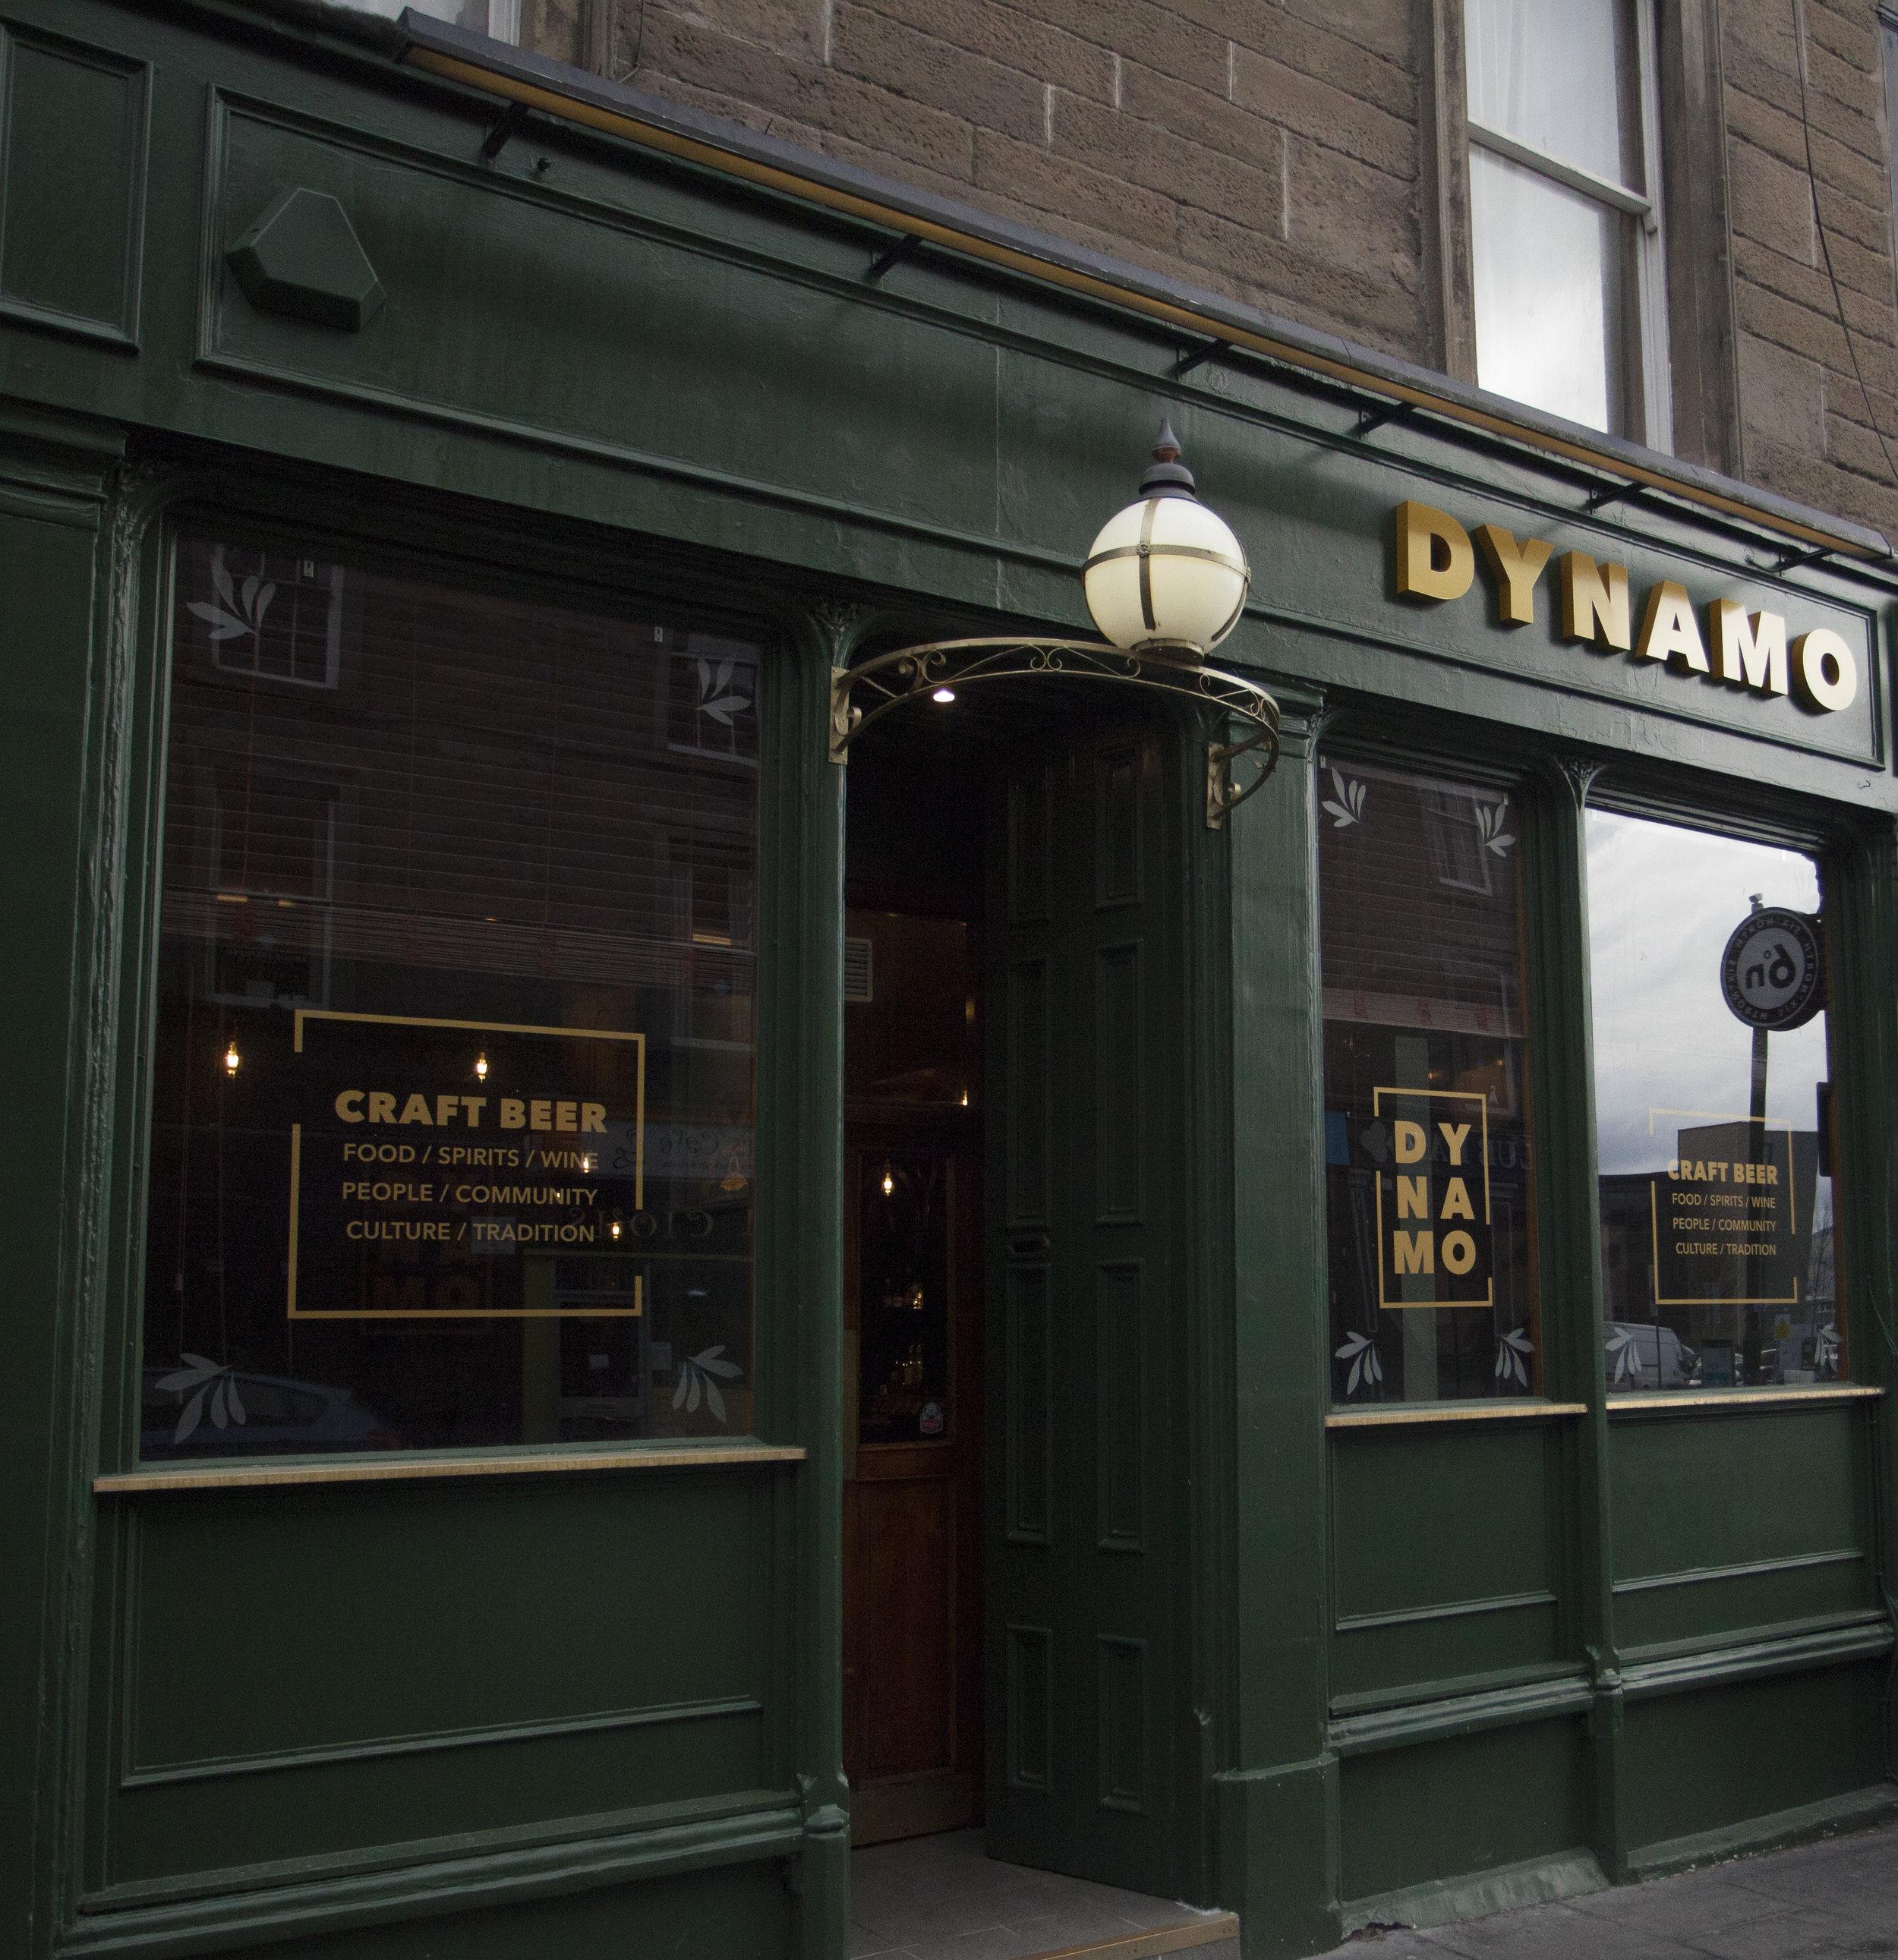 Dynamo exterior3.jpg